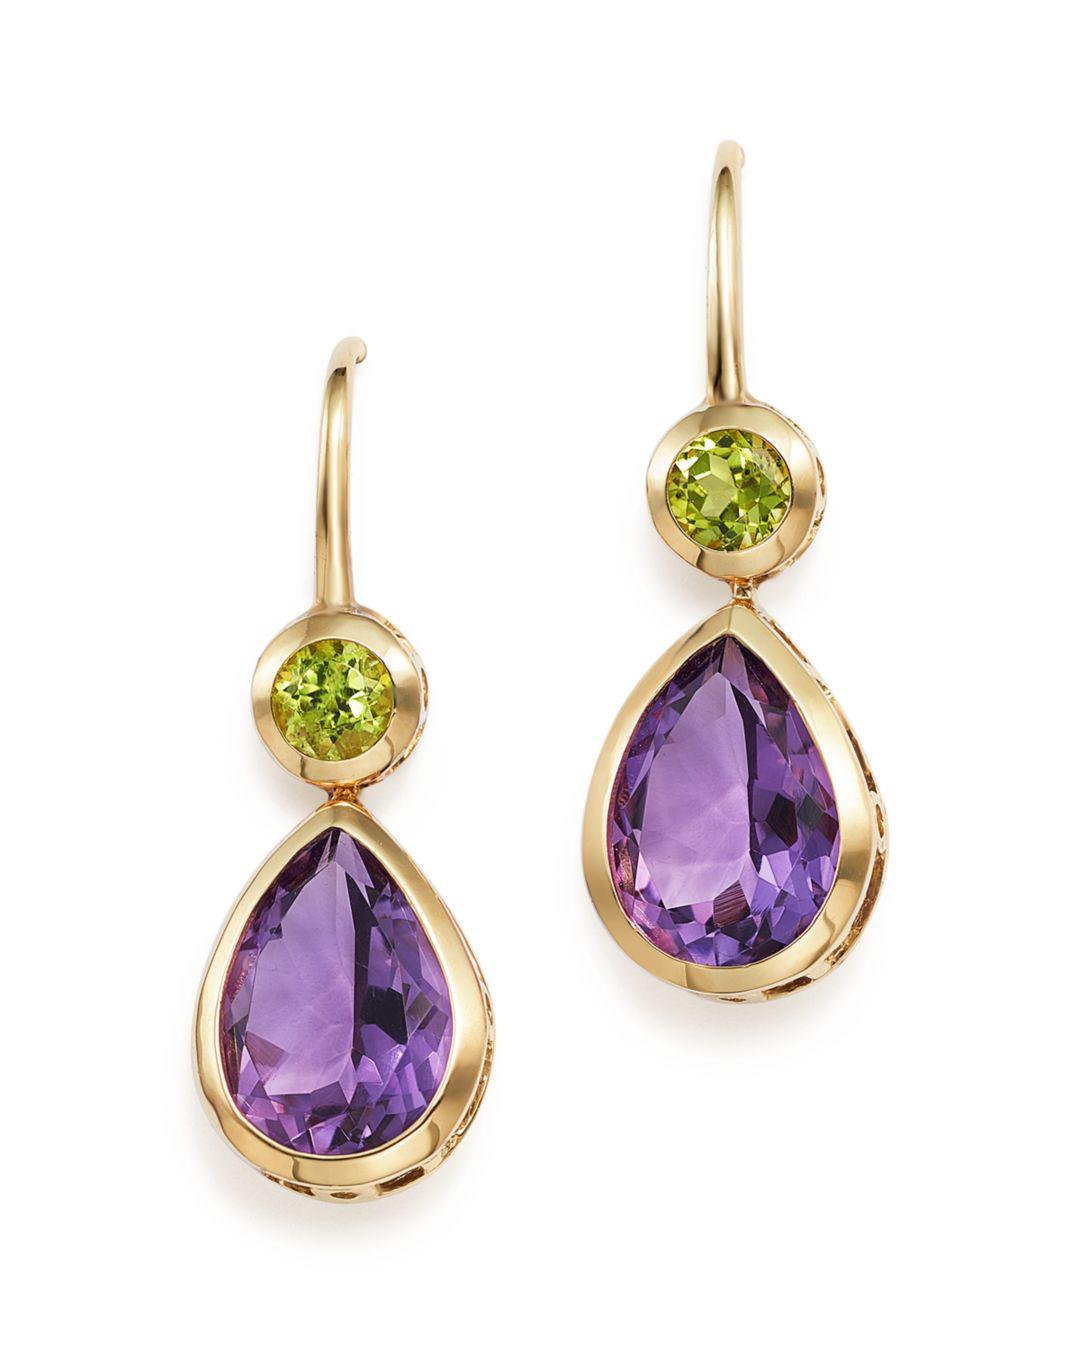 70945c0a86144 Bloomingdale's Amethyst And Peridot Drop Earrings In 14k Yellow Gold ...